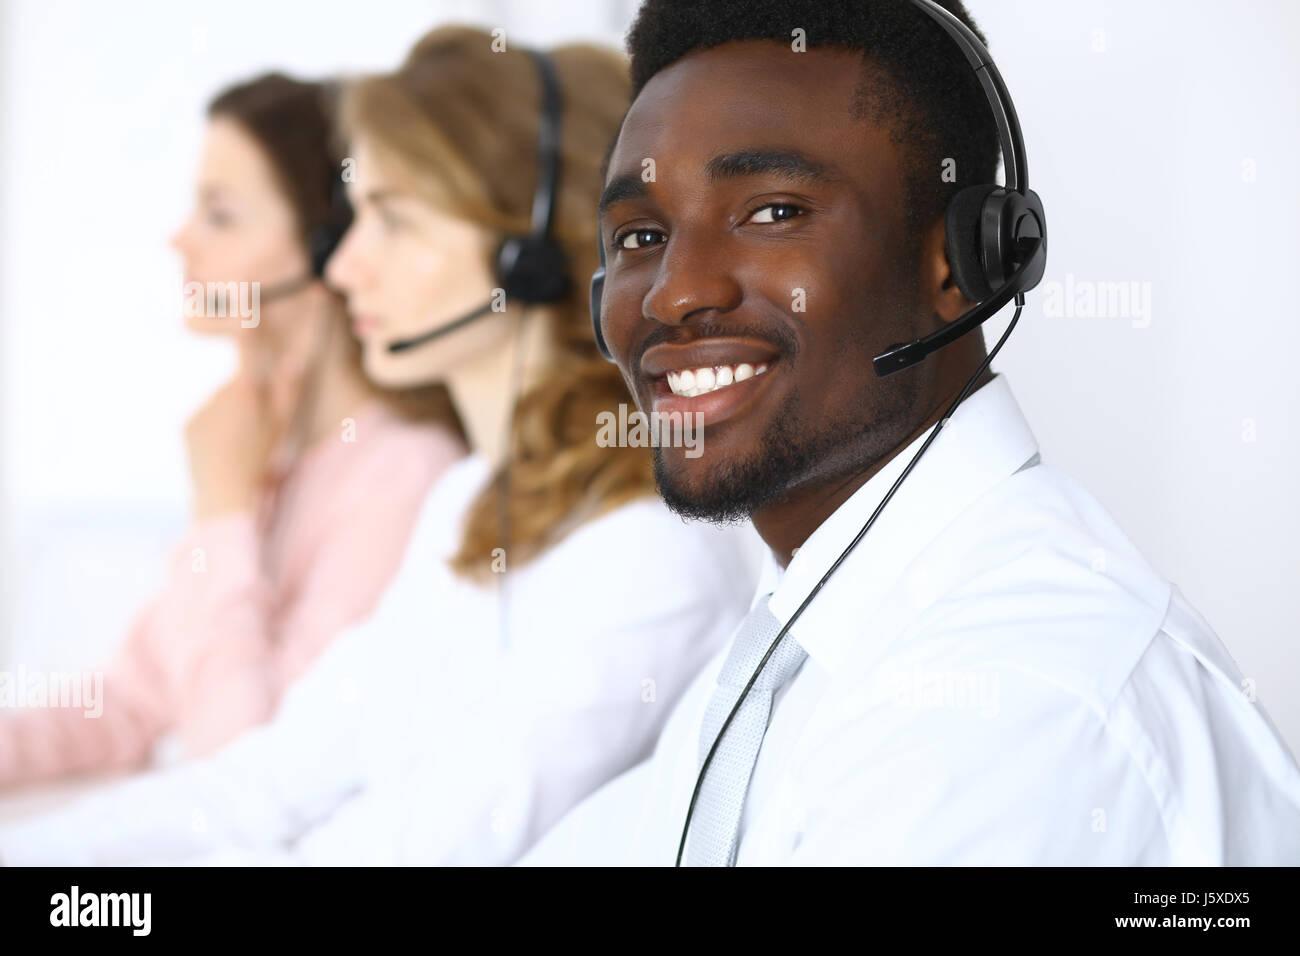 Telesales Operator Stock Photos & Telesales Operator Stock